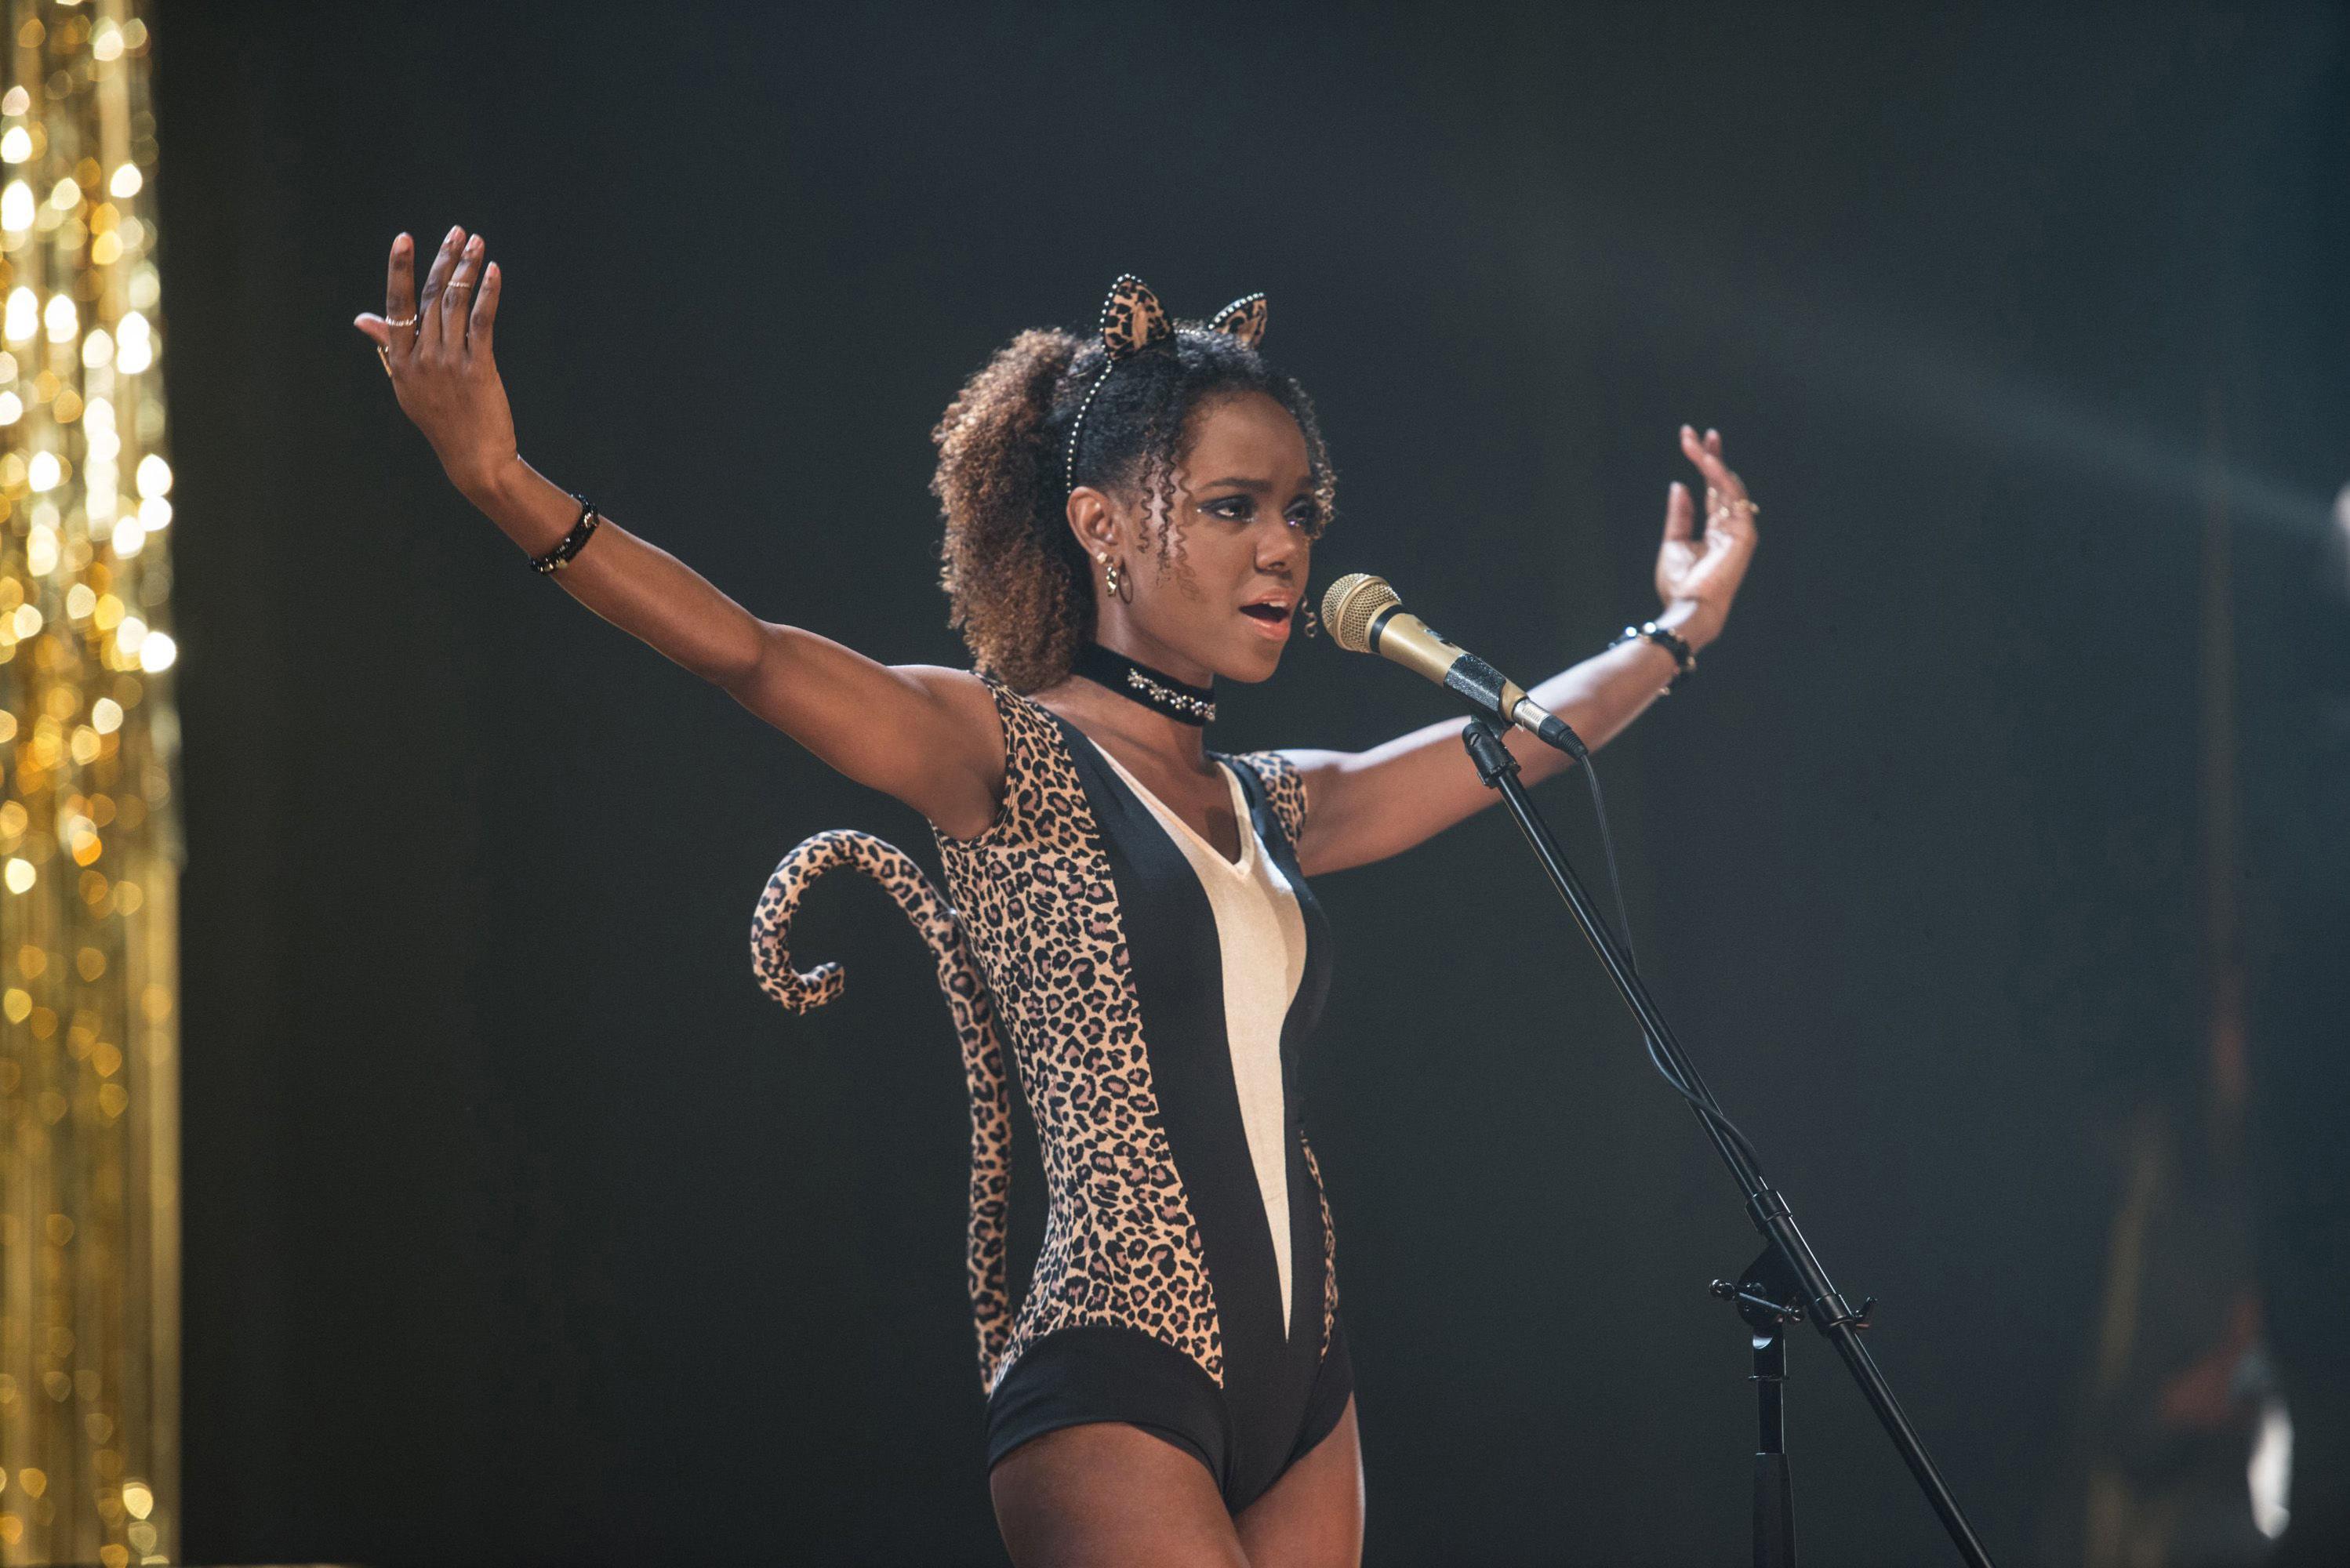 Ashleigh Murray performing as Josie